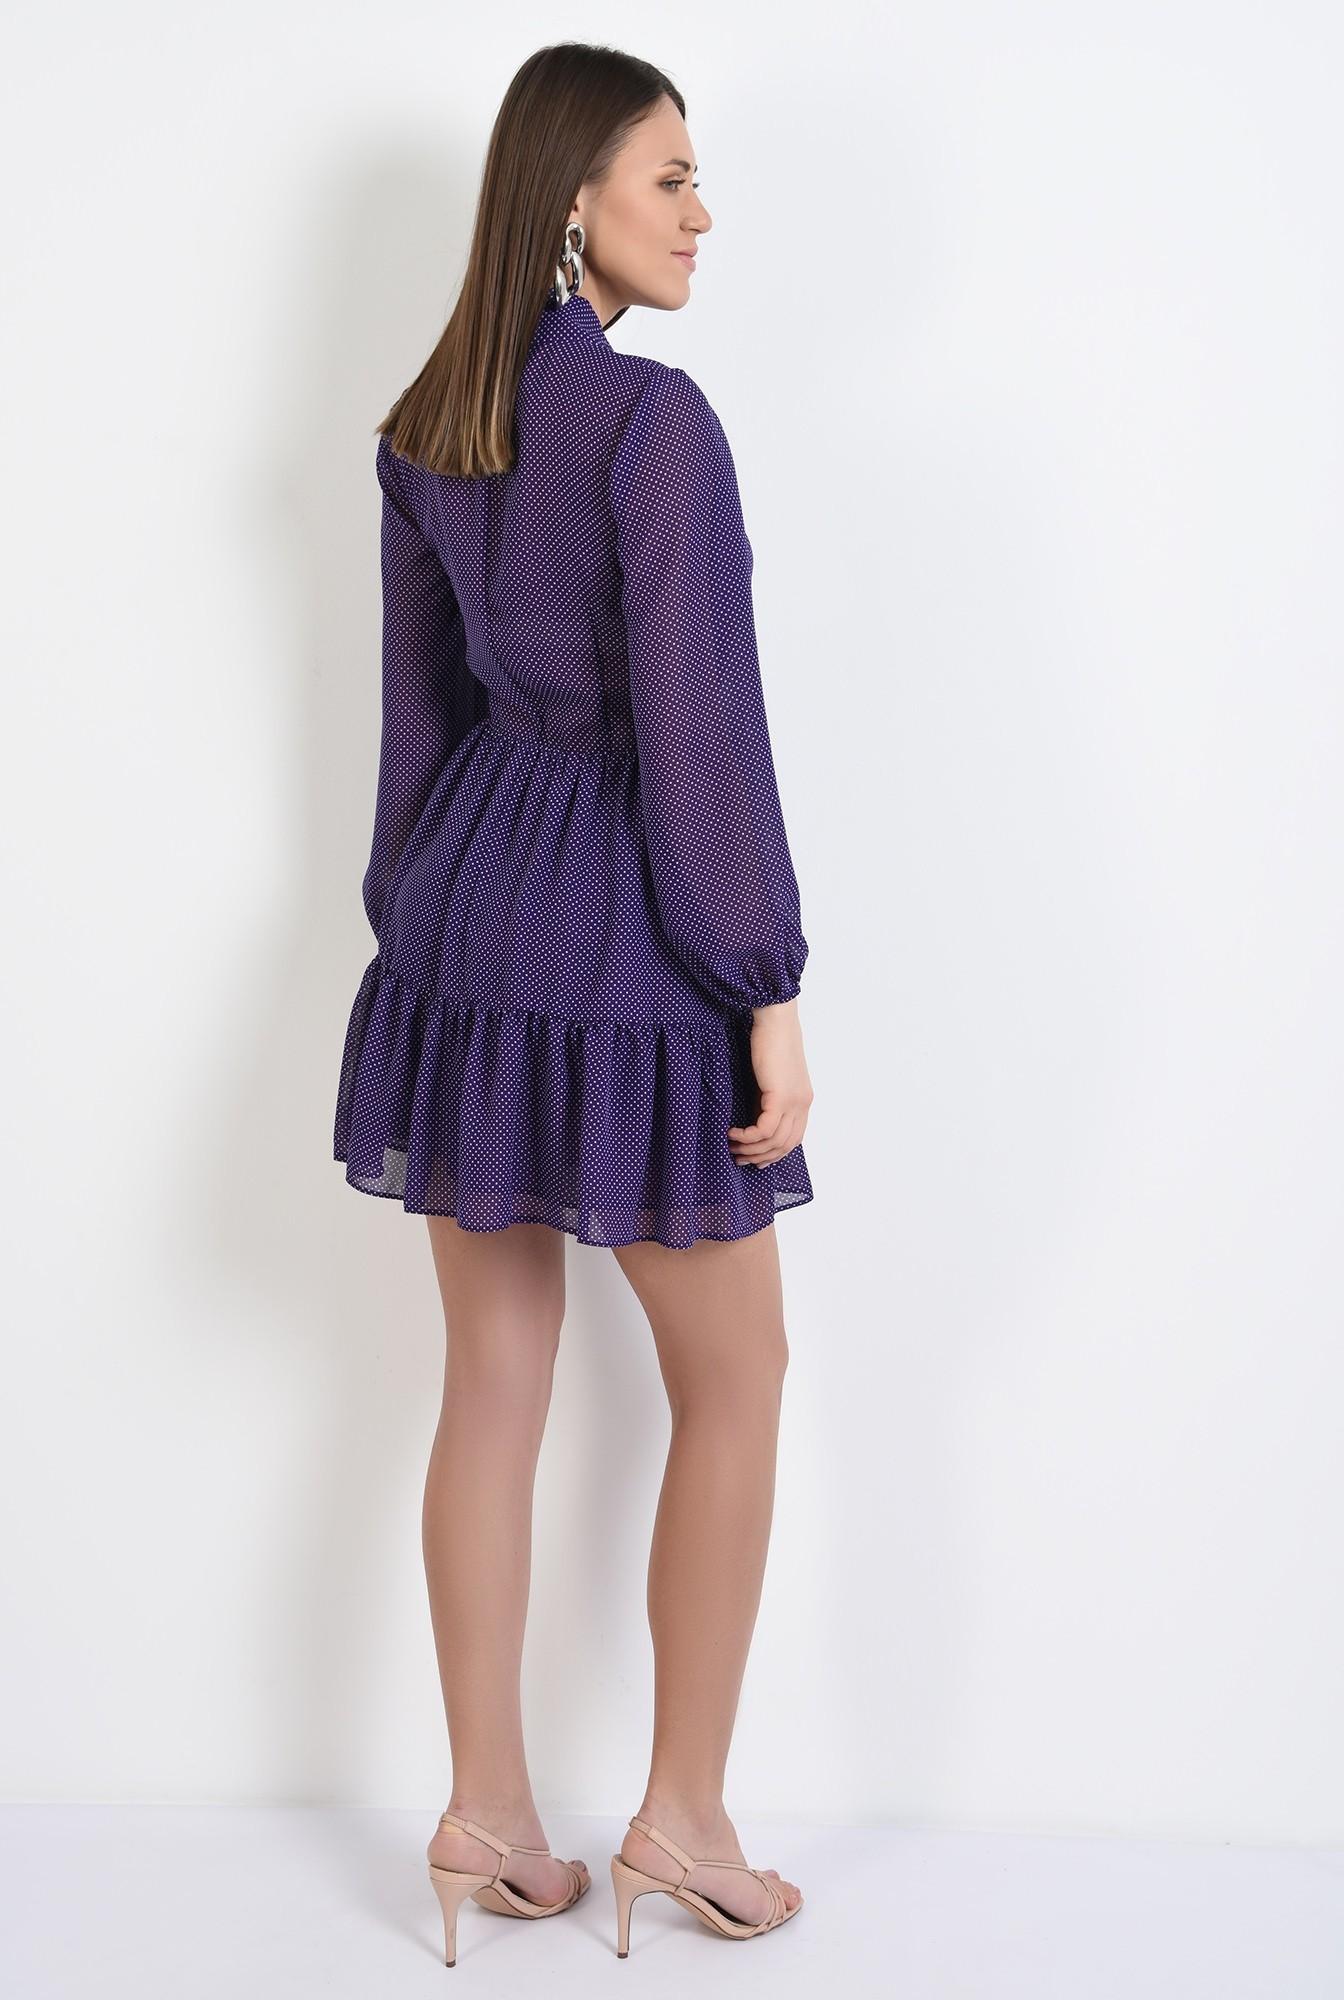 1 - rochie mini, cu volan, funda la gat, buline, voal, rochie de primavara